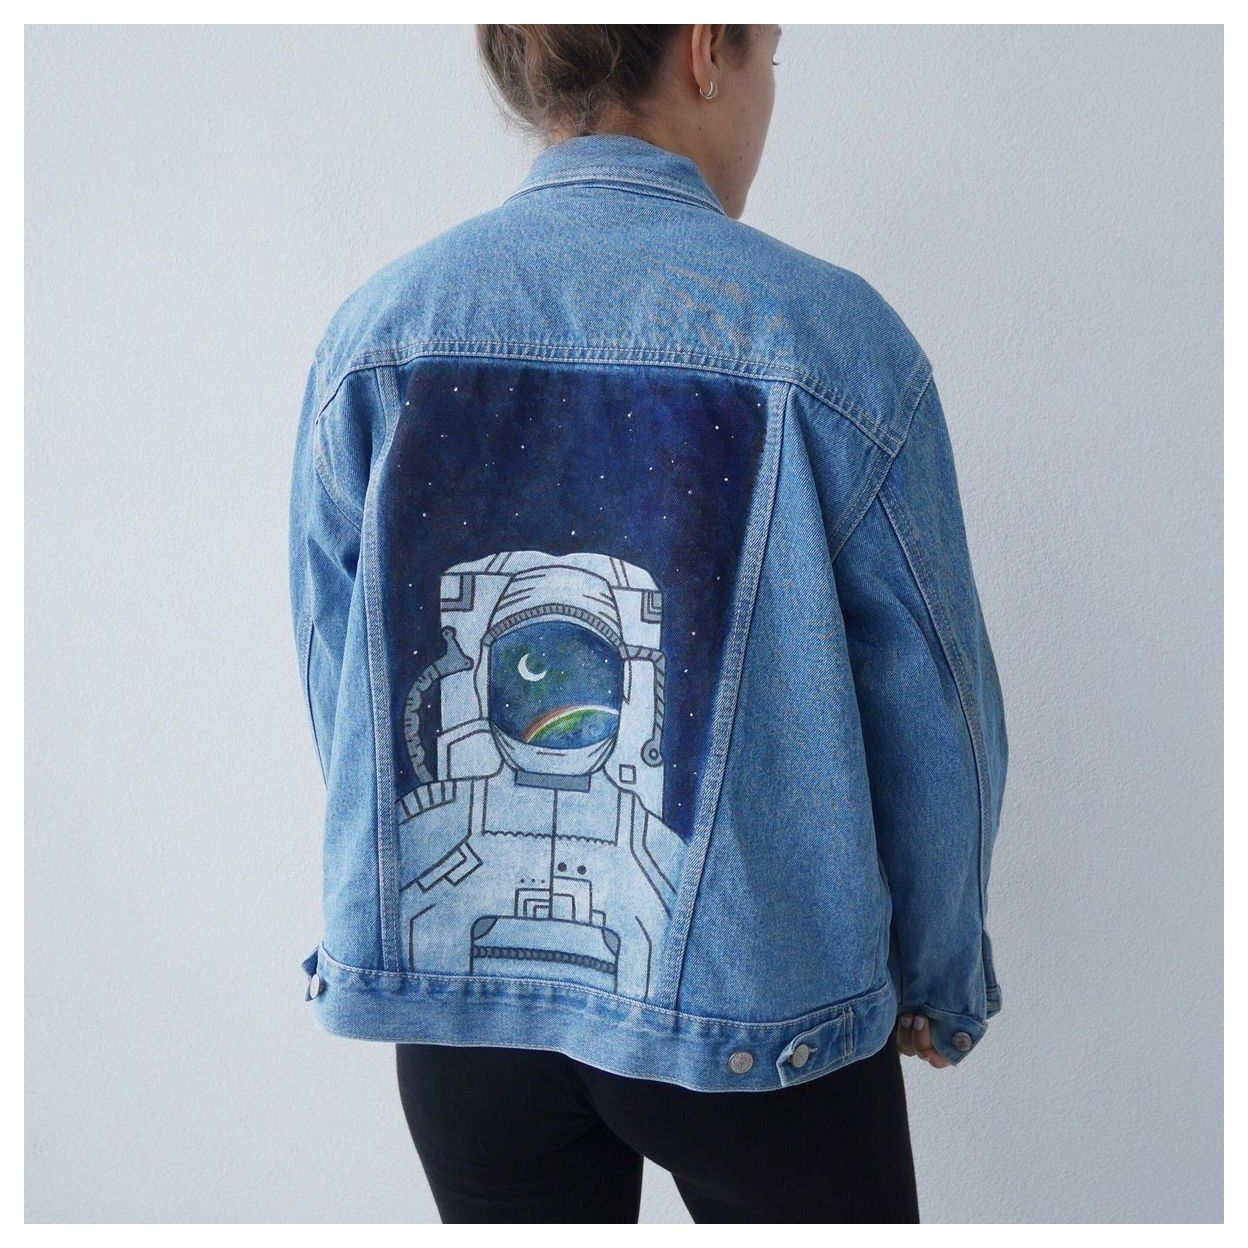 Denim Jacket Art Paint Denimjacketartpaint In 2021 Diy Denim Jacket Painted Denim Jacket Denim Diy [ 1248 x 1248 Pixel ]